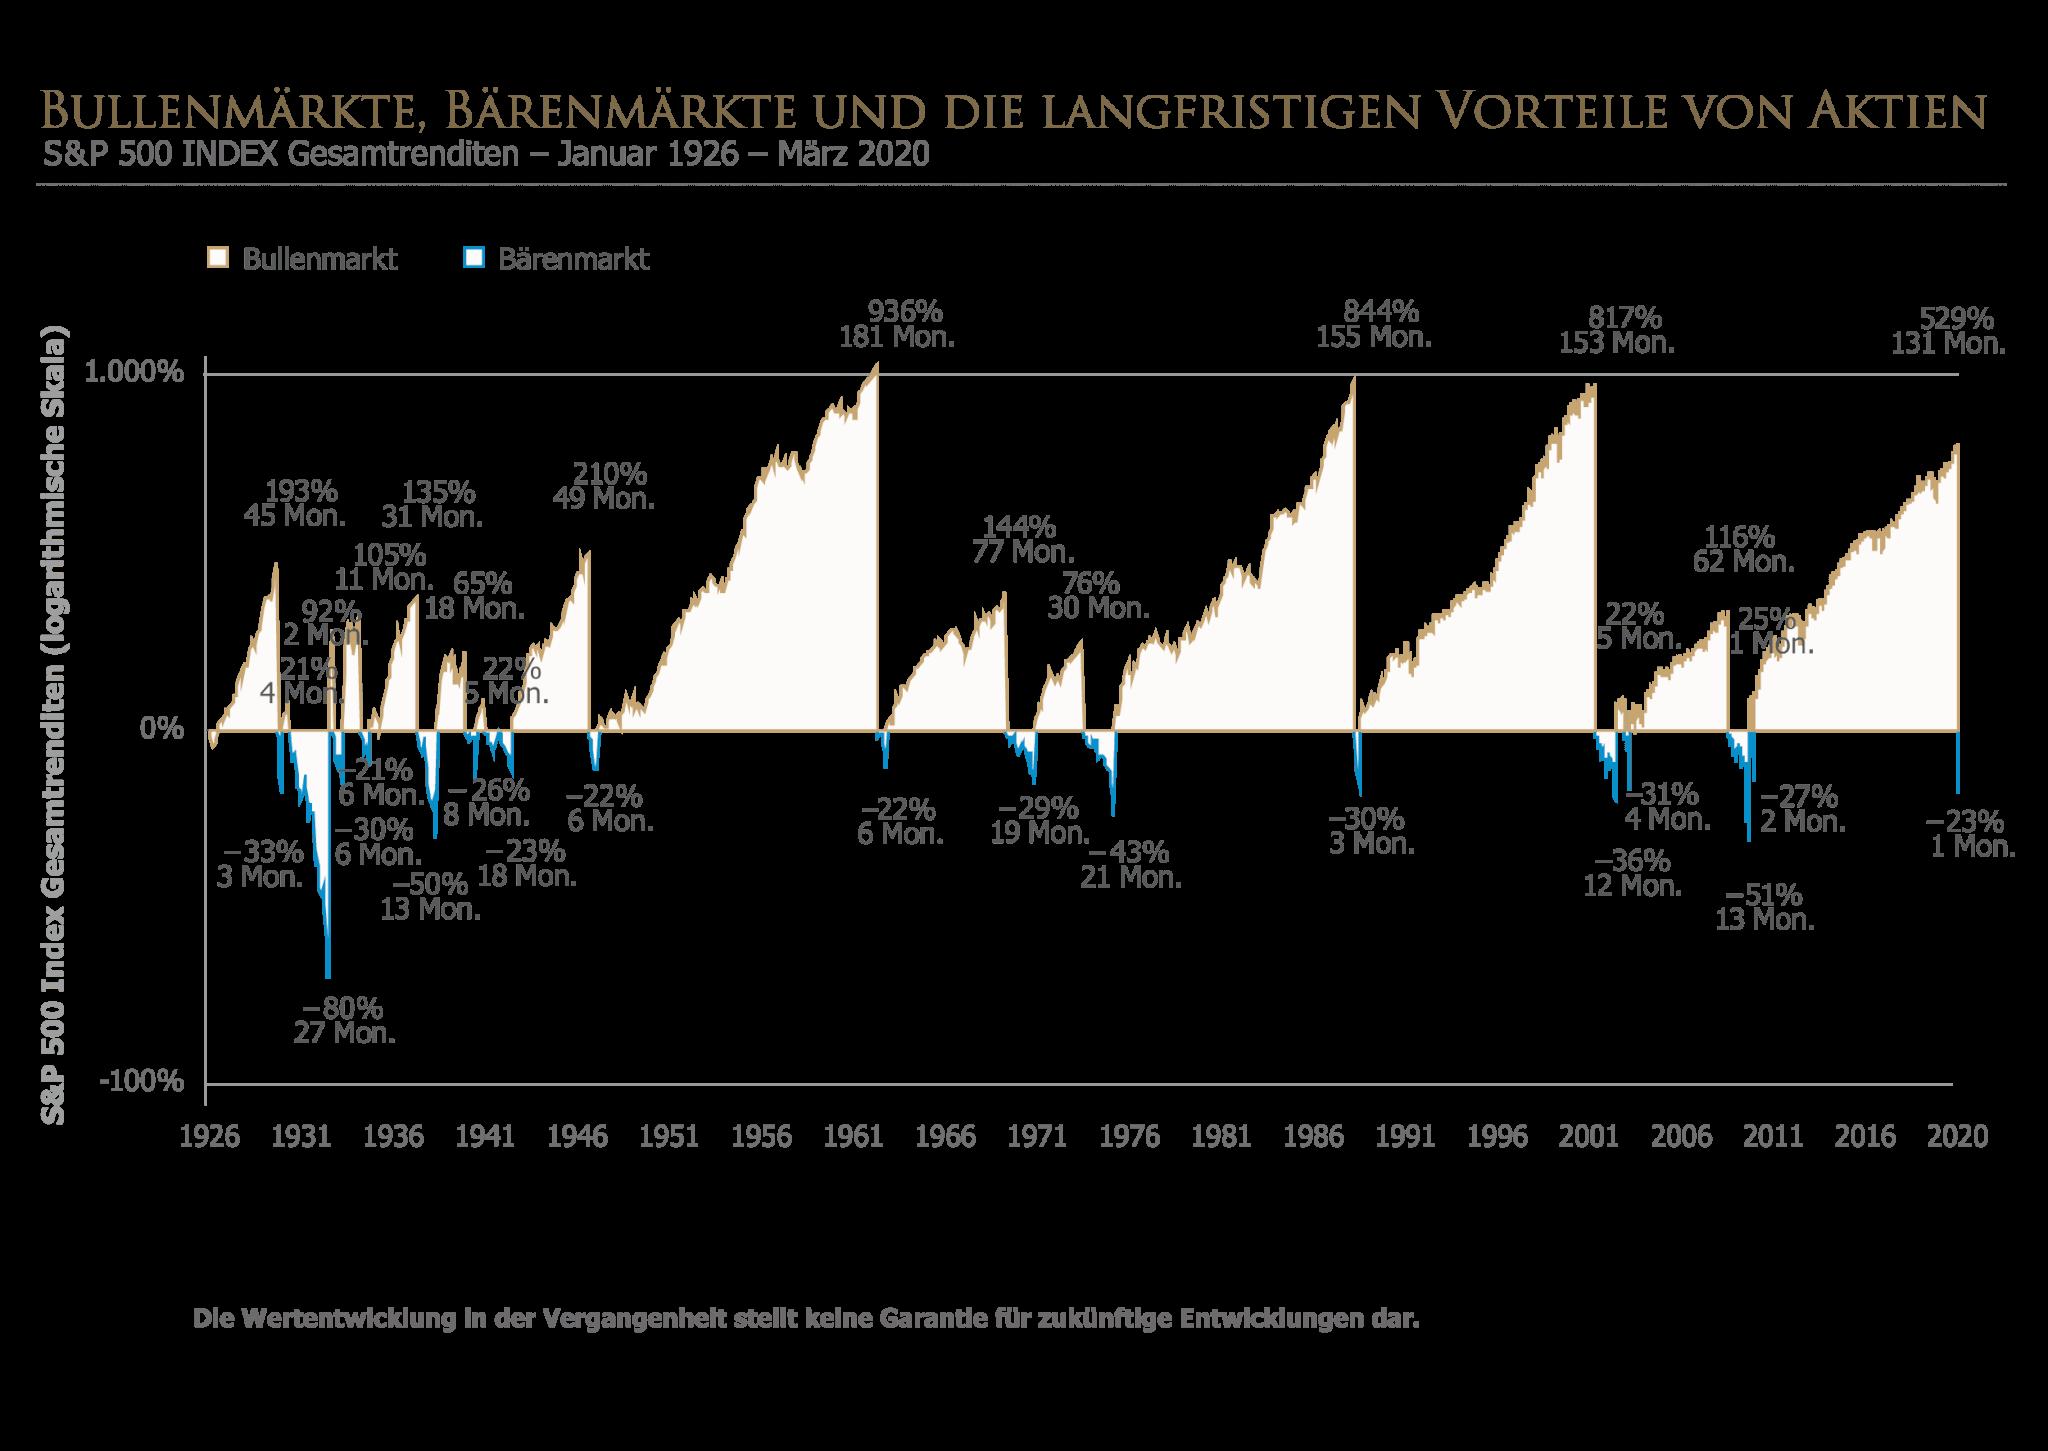 Volatitlität an den Aktienmärkten mit Happy End